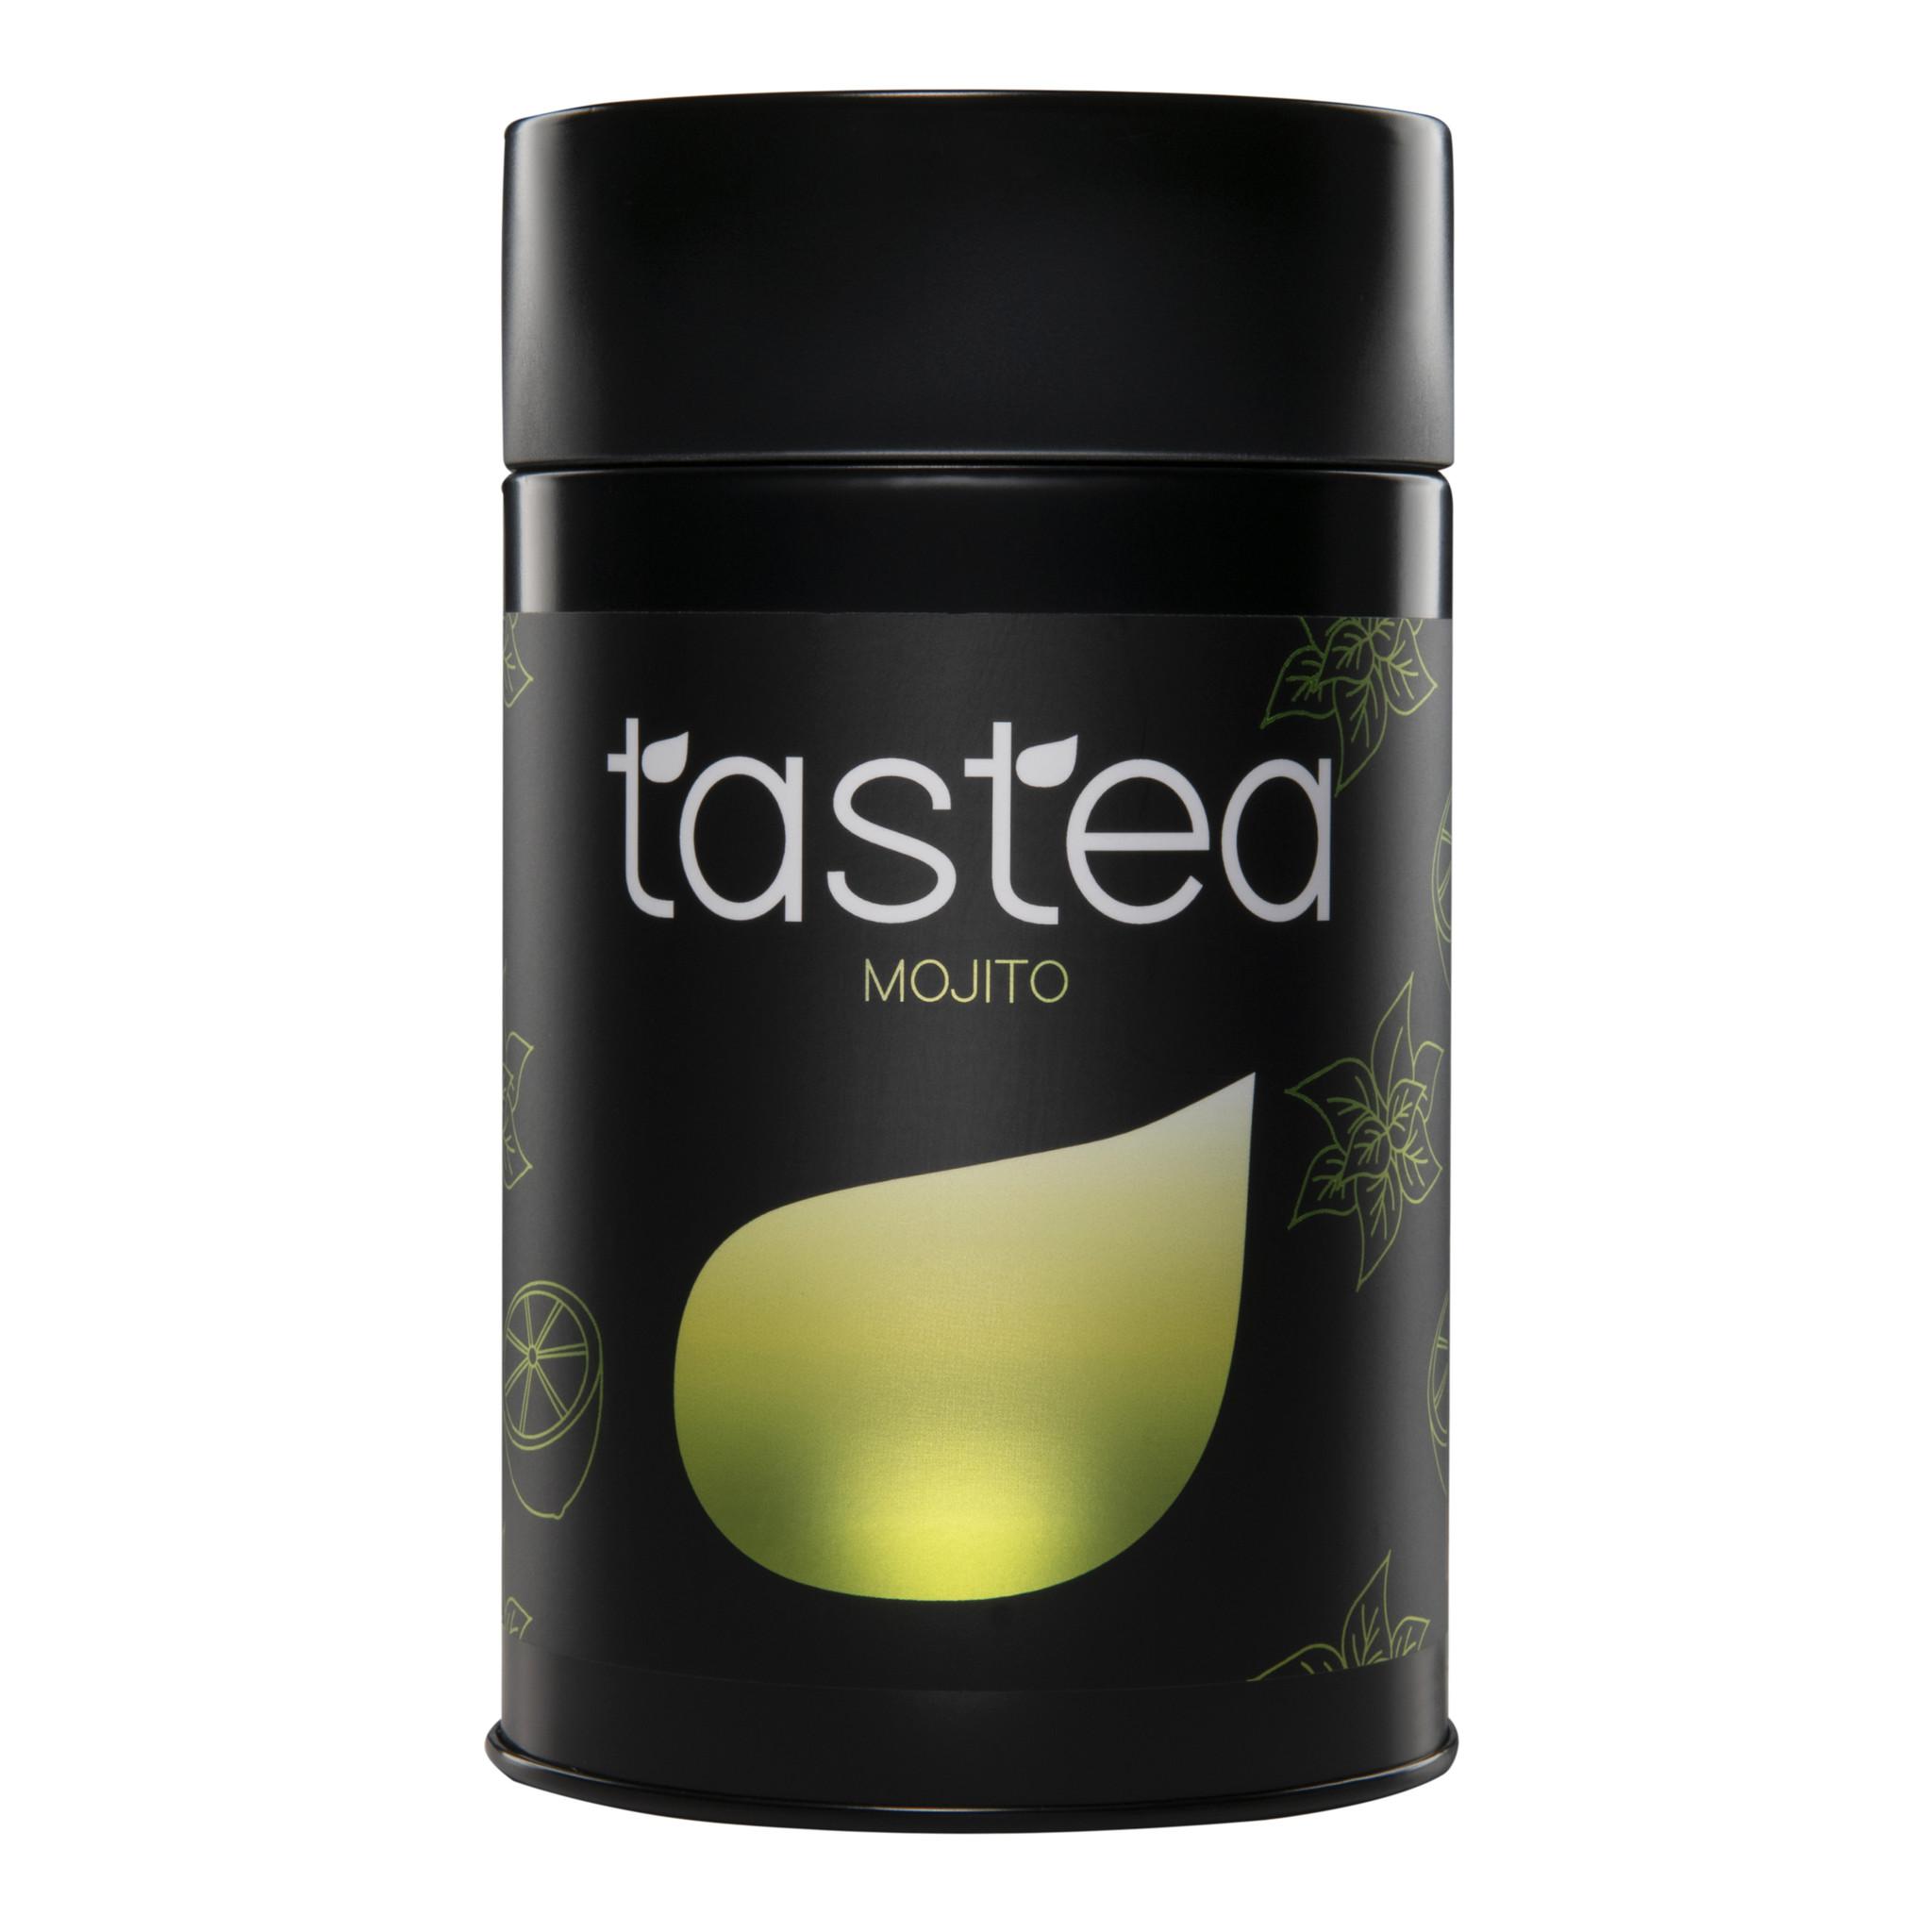 Tastea Mojito thee 100 gram